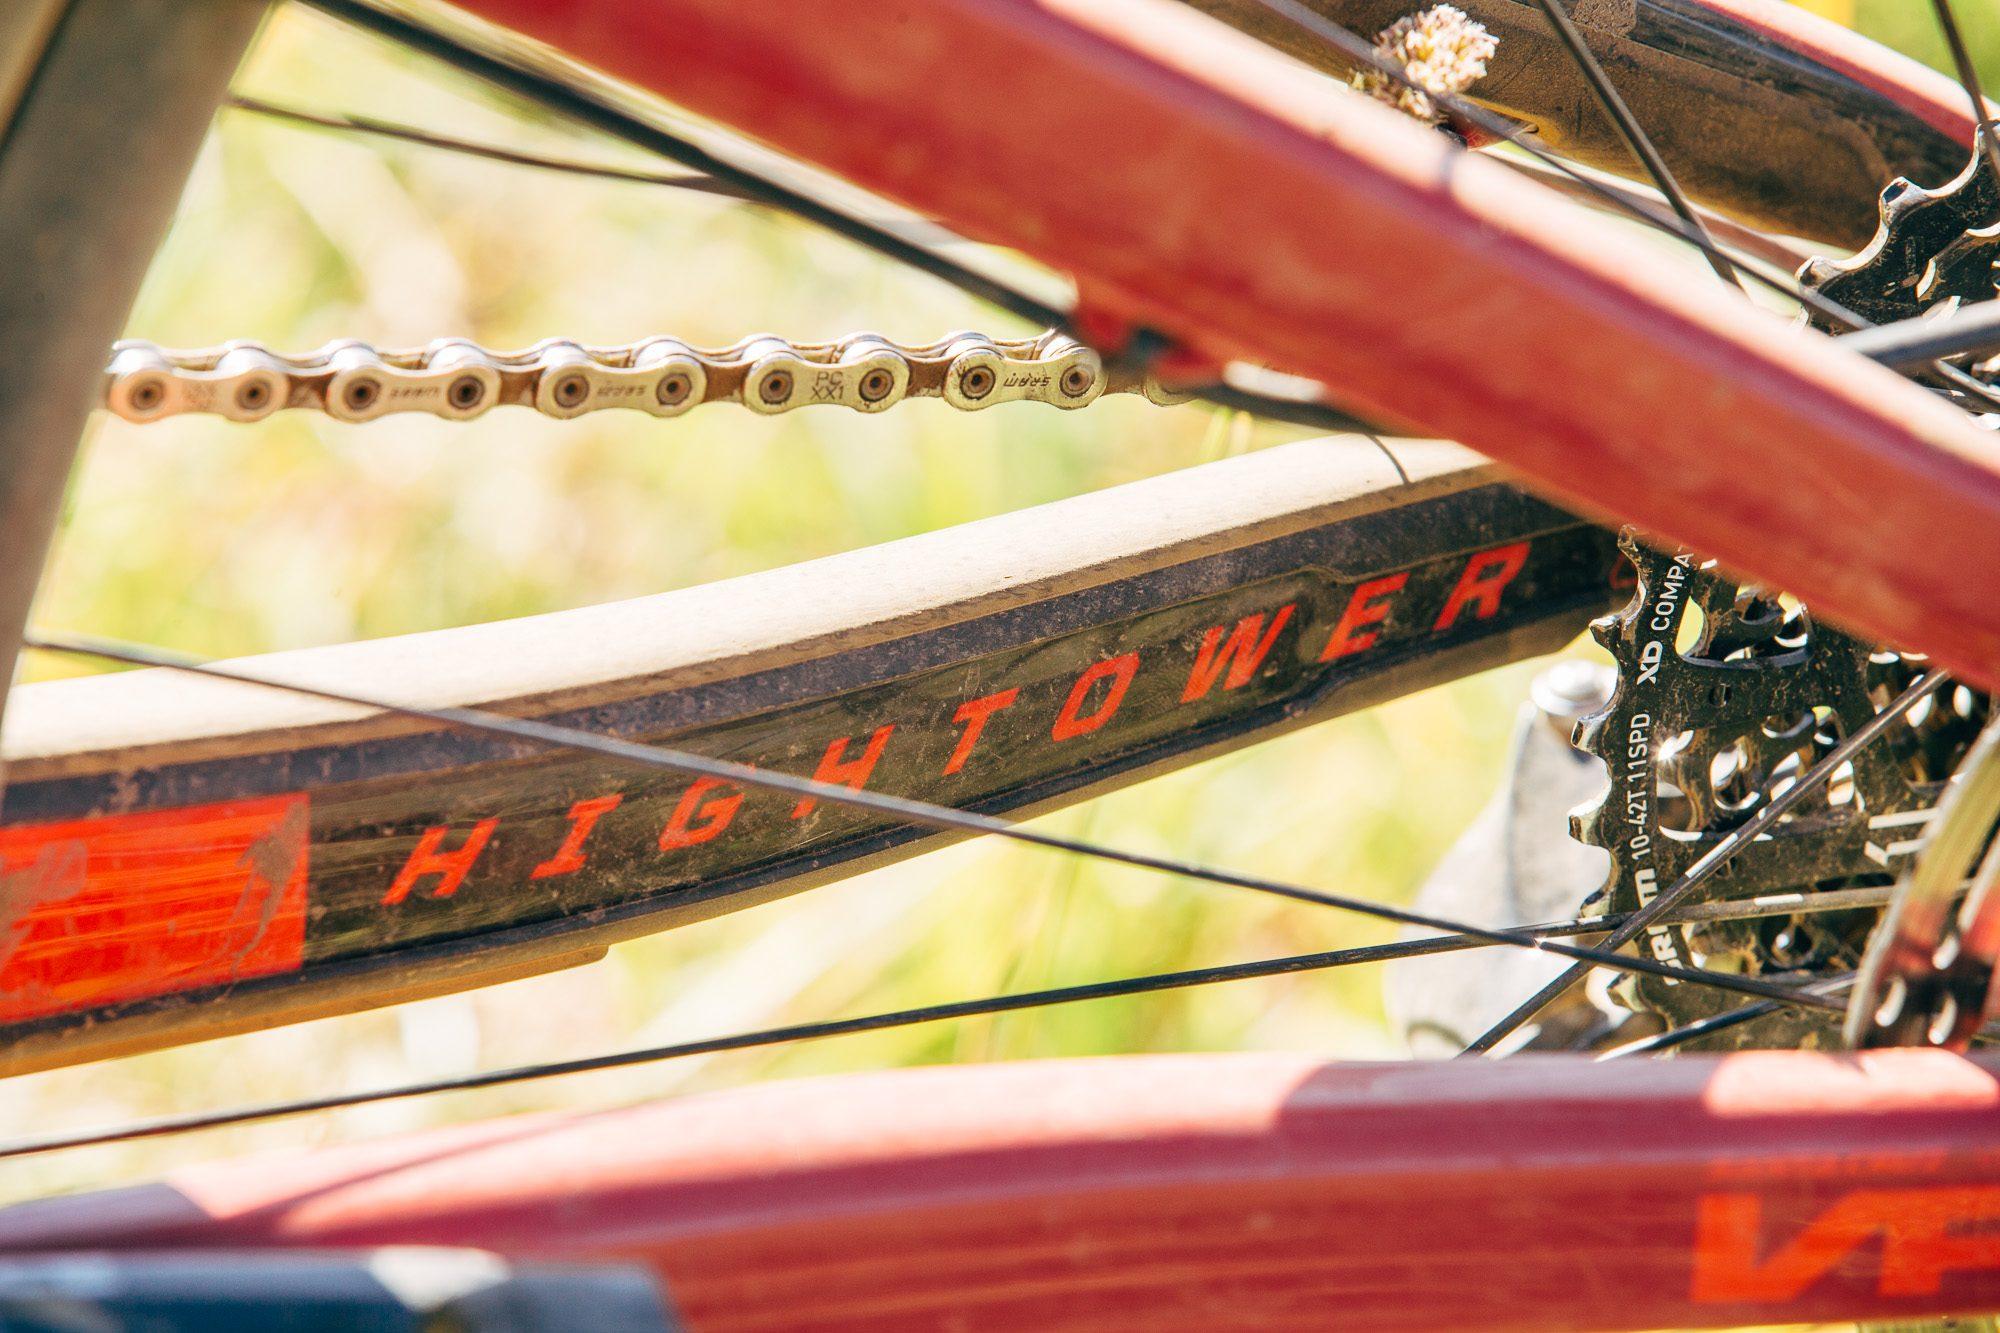 The Santa Cruz Bicycles Hightower with 29'r Wheels